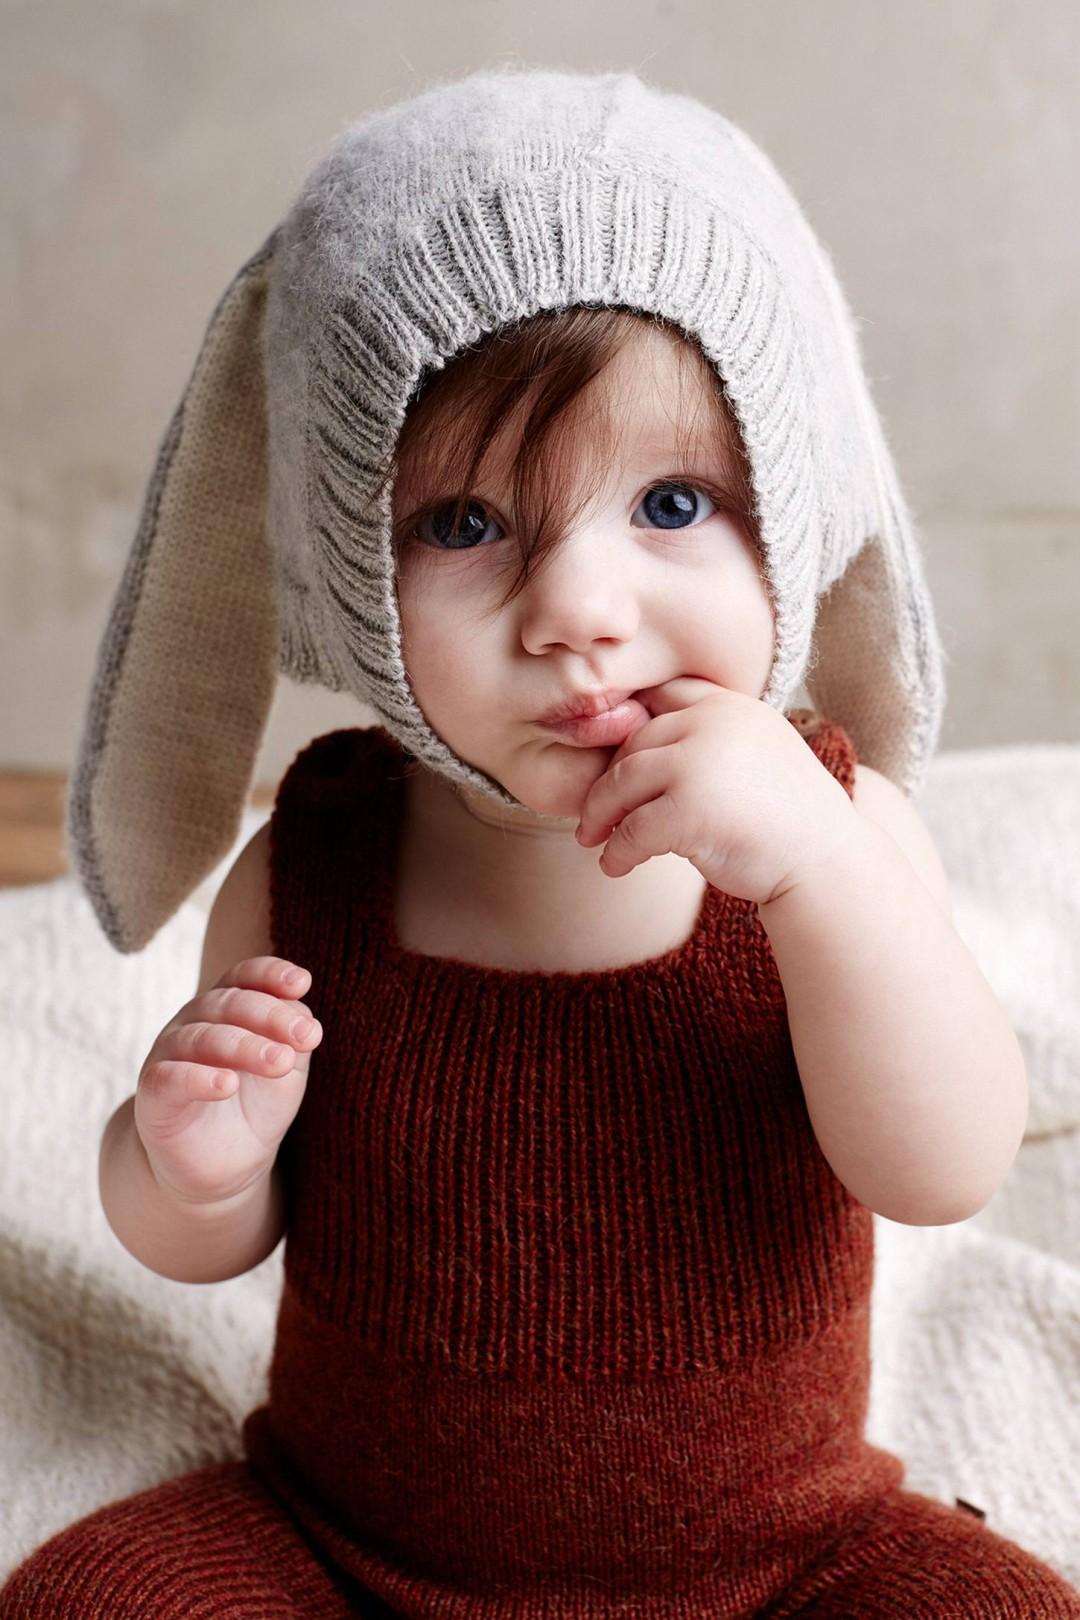 24 Baby Hat Knitting Patterns - The Funky Stitch